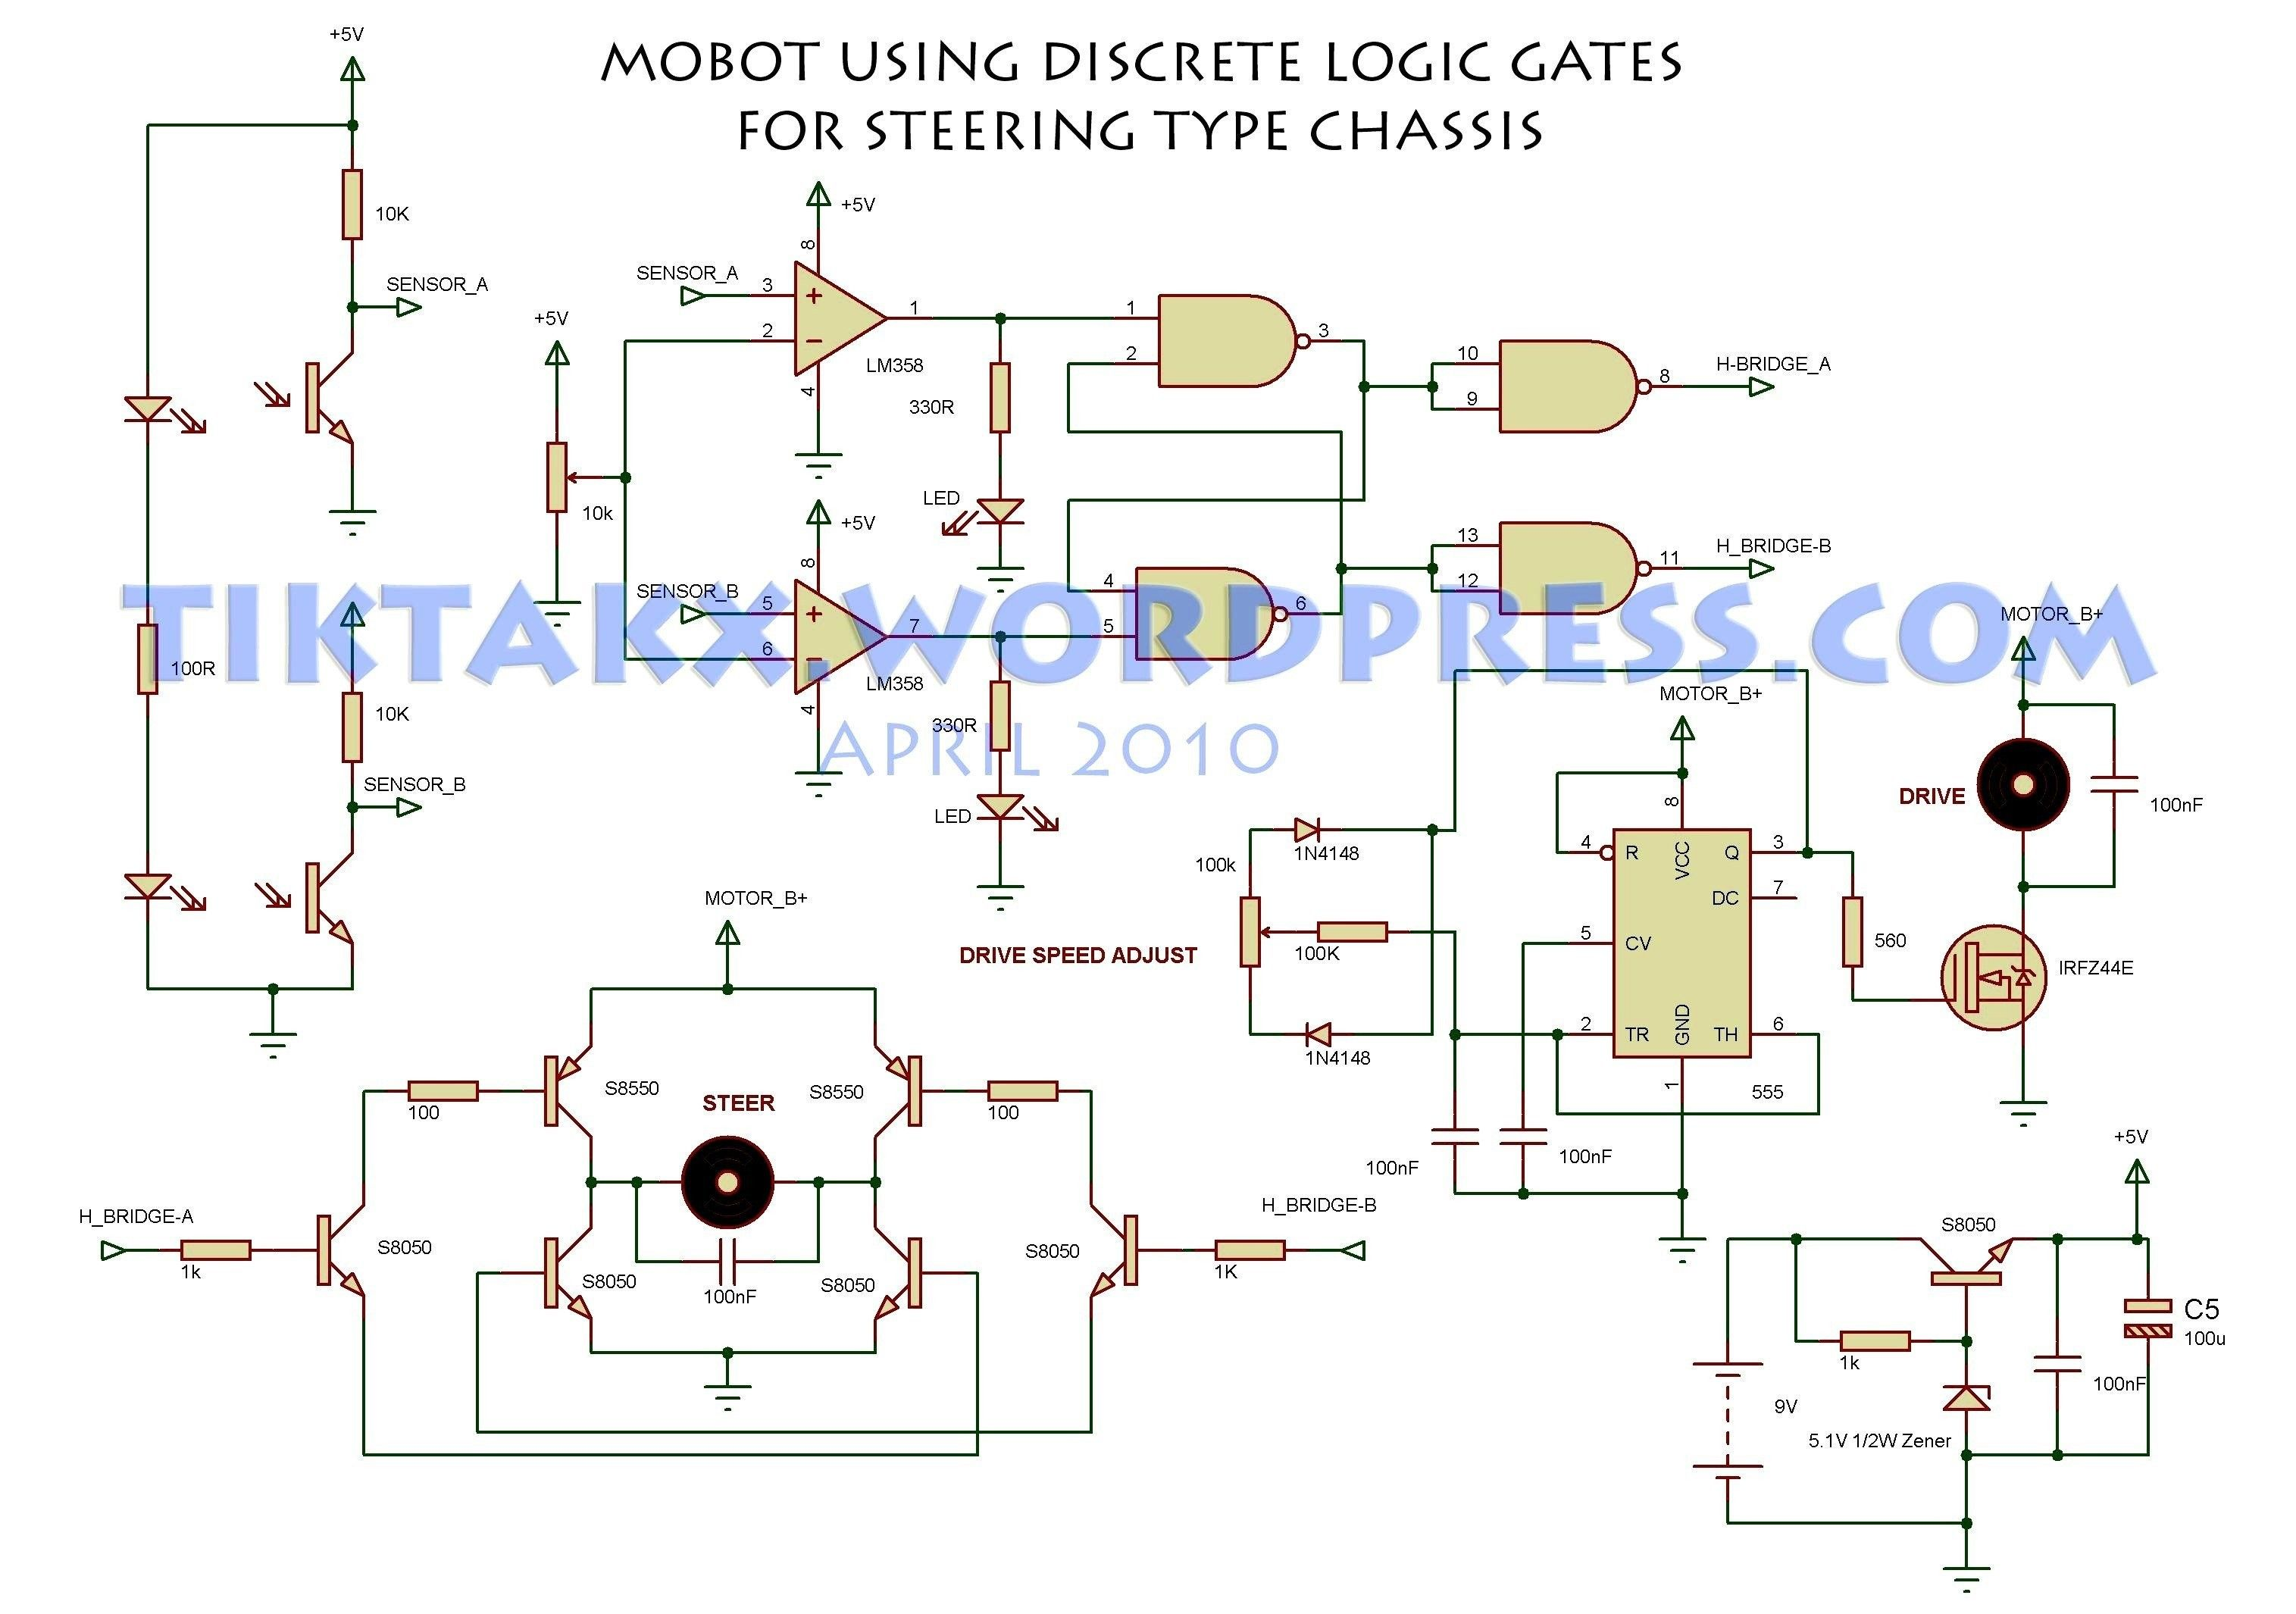 Unique Wiring Diagram Electric Gates Diagram Diagramsample Diagramtemplate Wiringdiagram Diagramchart Worksheet Workshee Circuit Diagram Diagram Toy Car